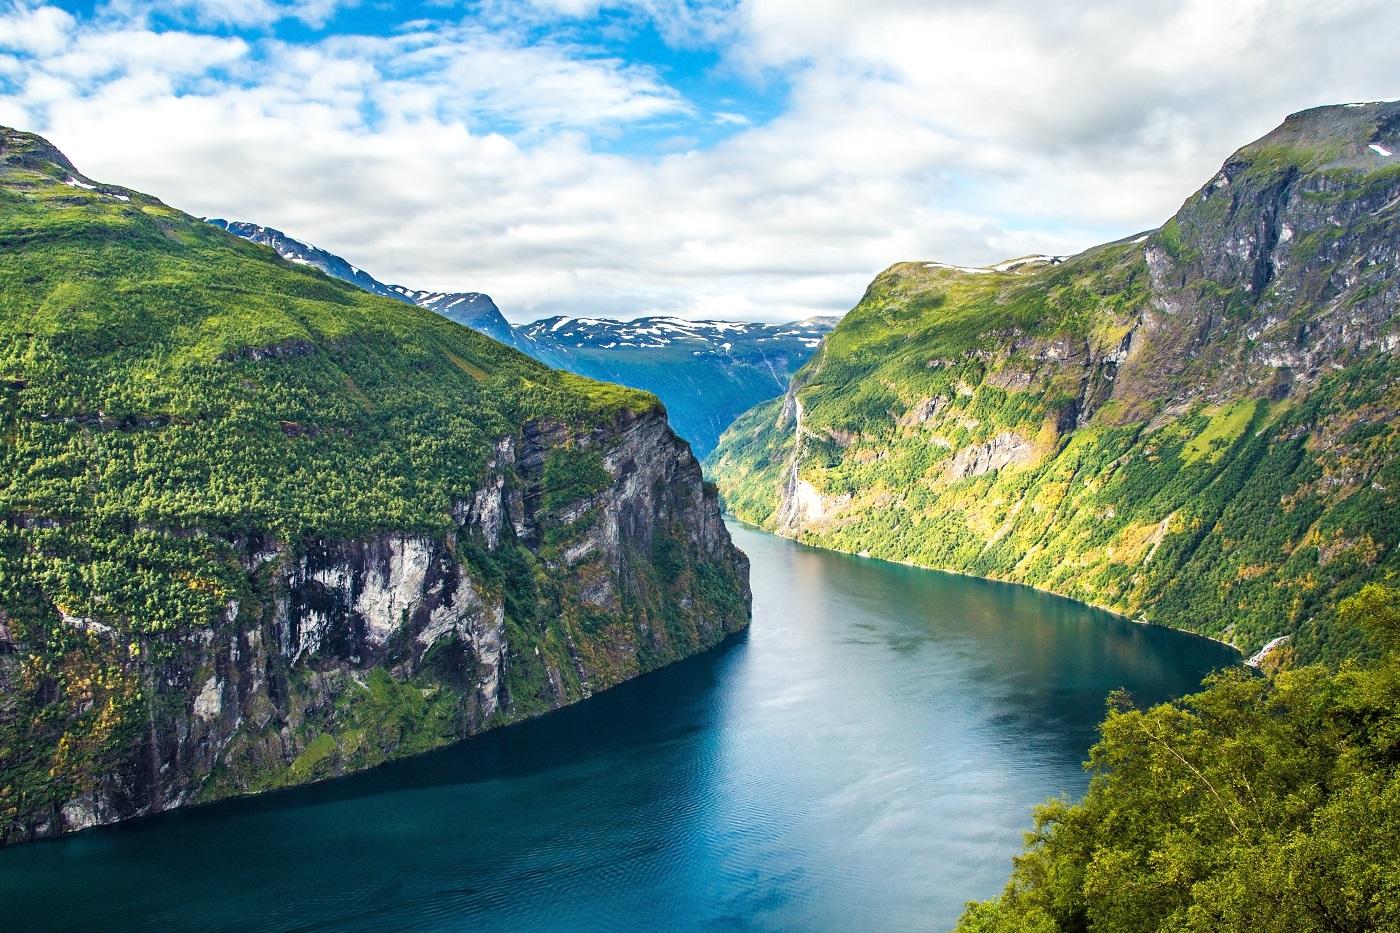 Day 18-21: Ålesund, Trollstigen, Geiranger - The most beautiful of Norway! (...seen so far) UPD 2017 - Finland Travel Blog - Best Places to Visit in Europe